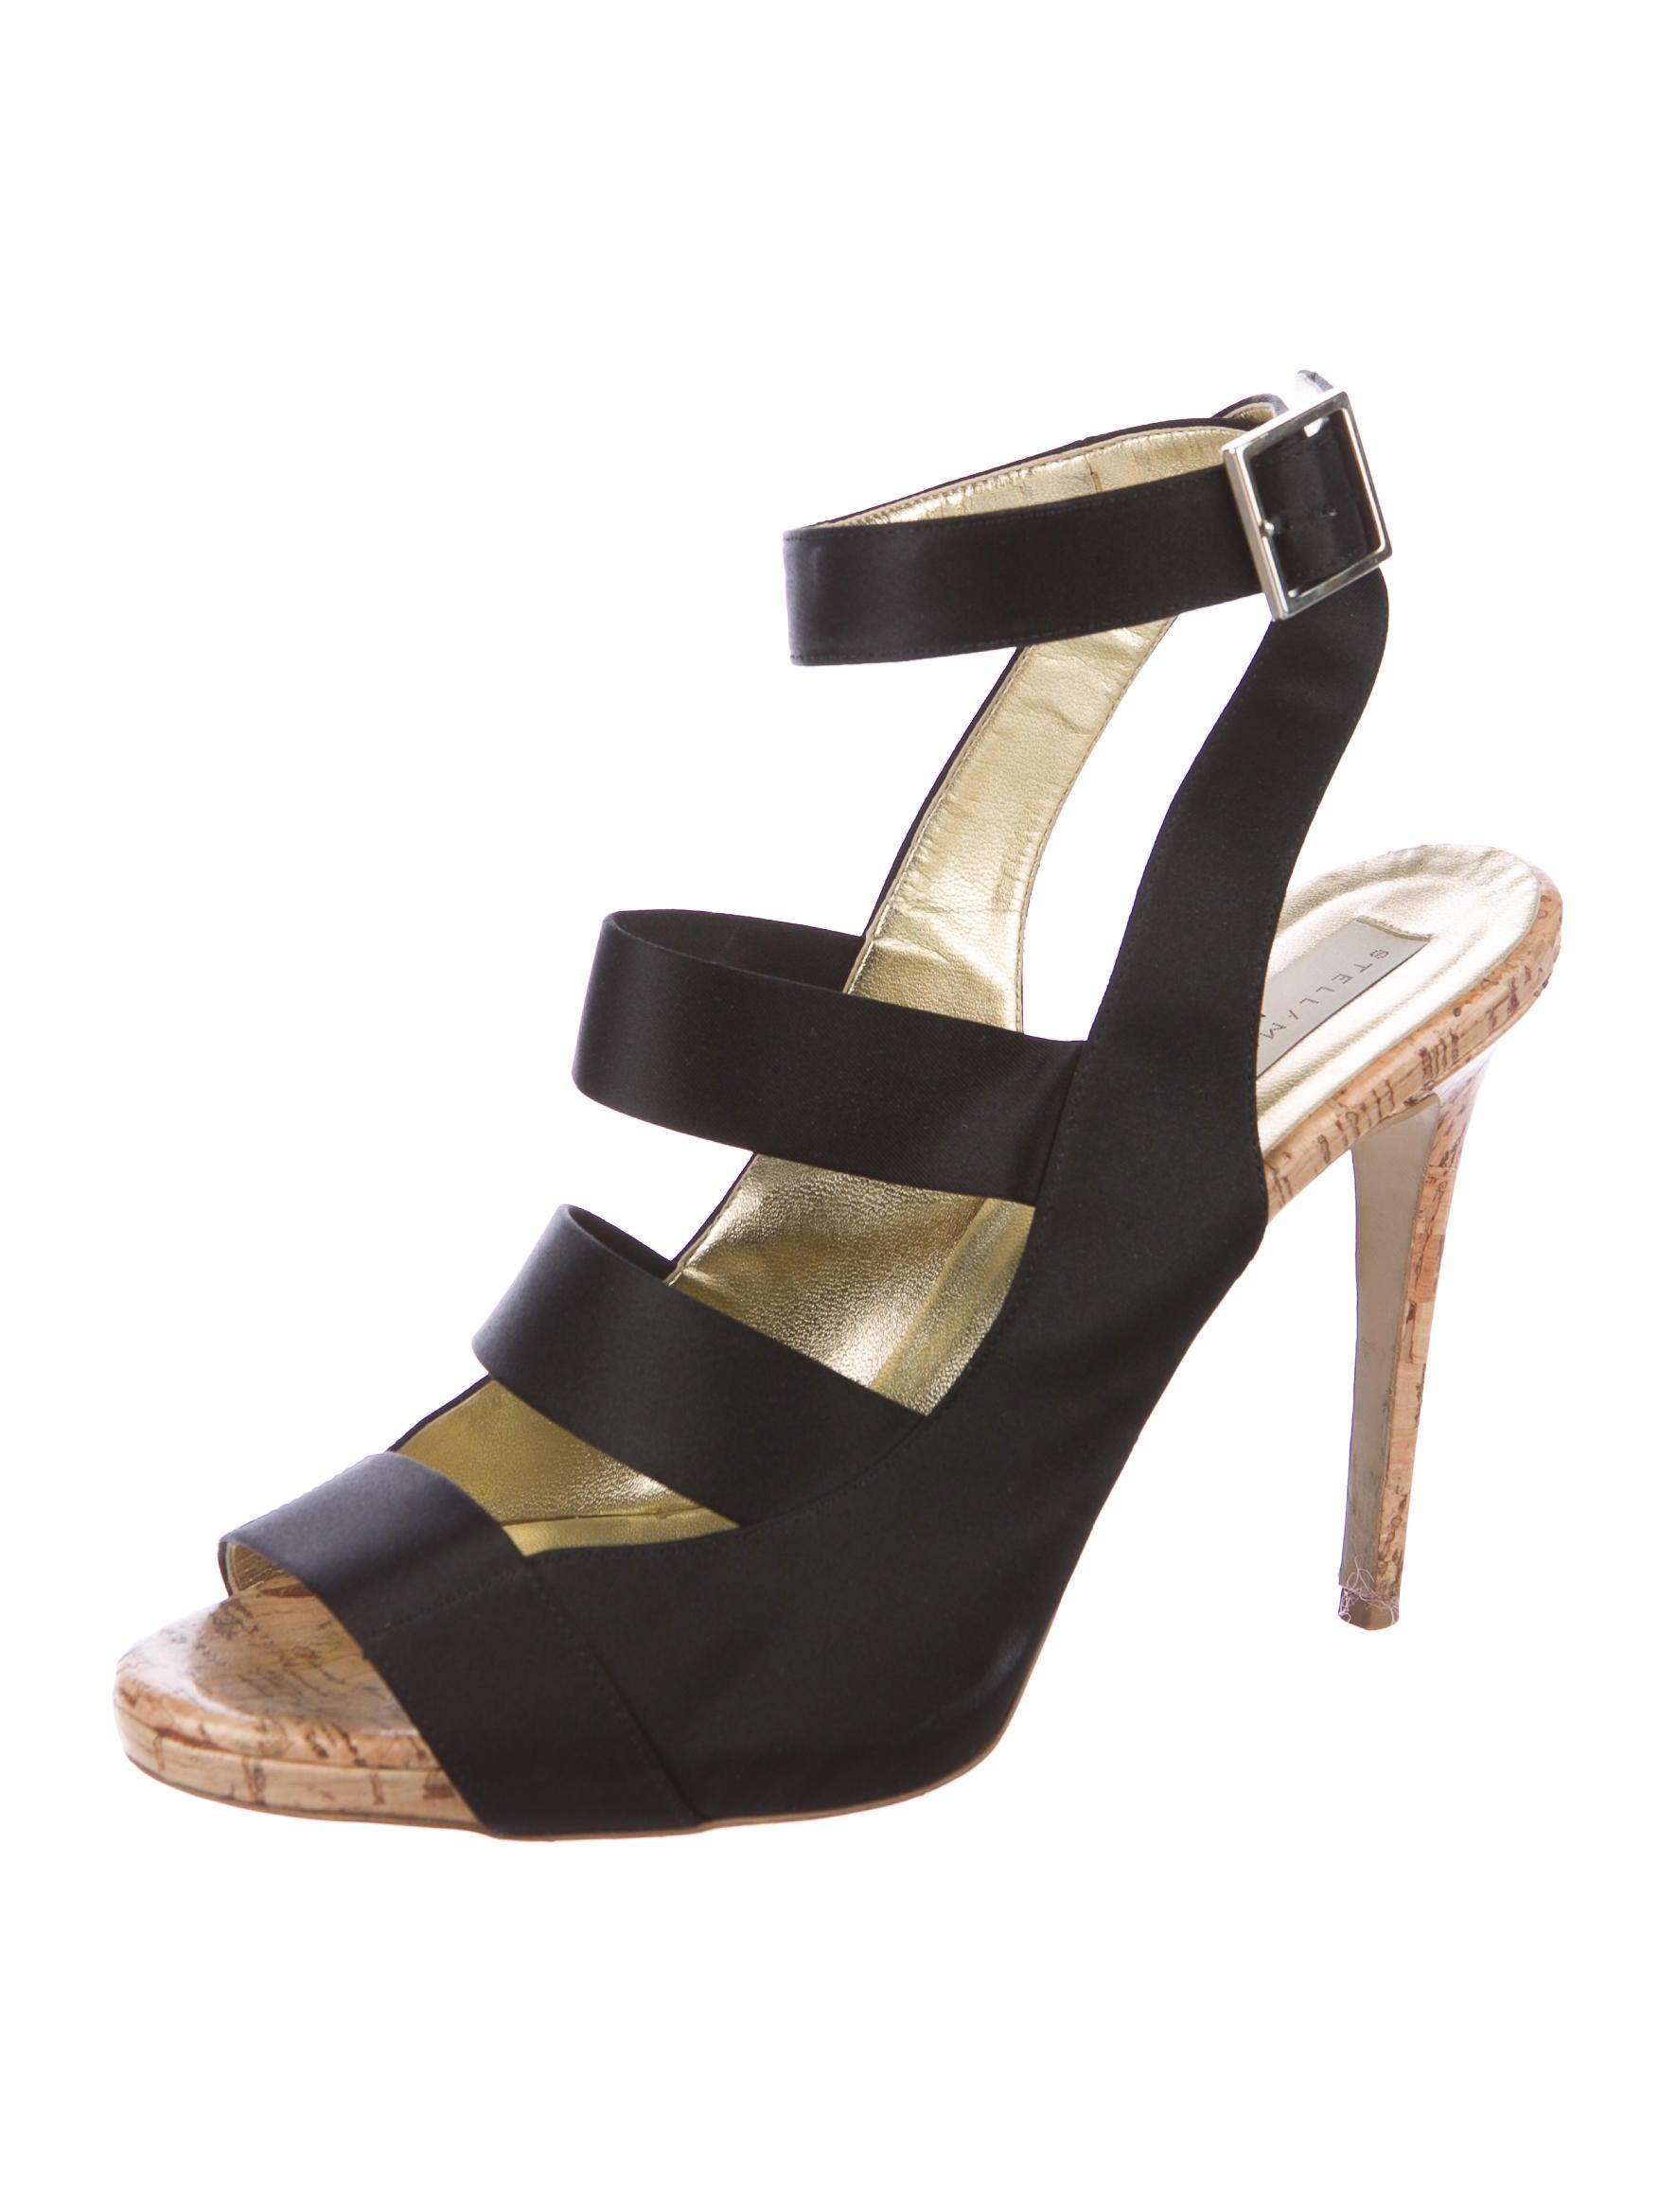 official sale online Stella McCartney Multistrap Satin Sandals huge surprise cheap price collections ta5nMEk0mM